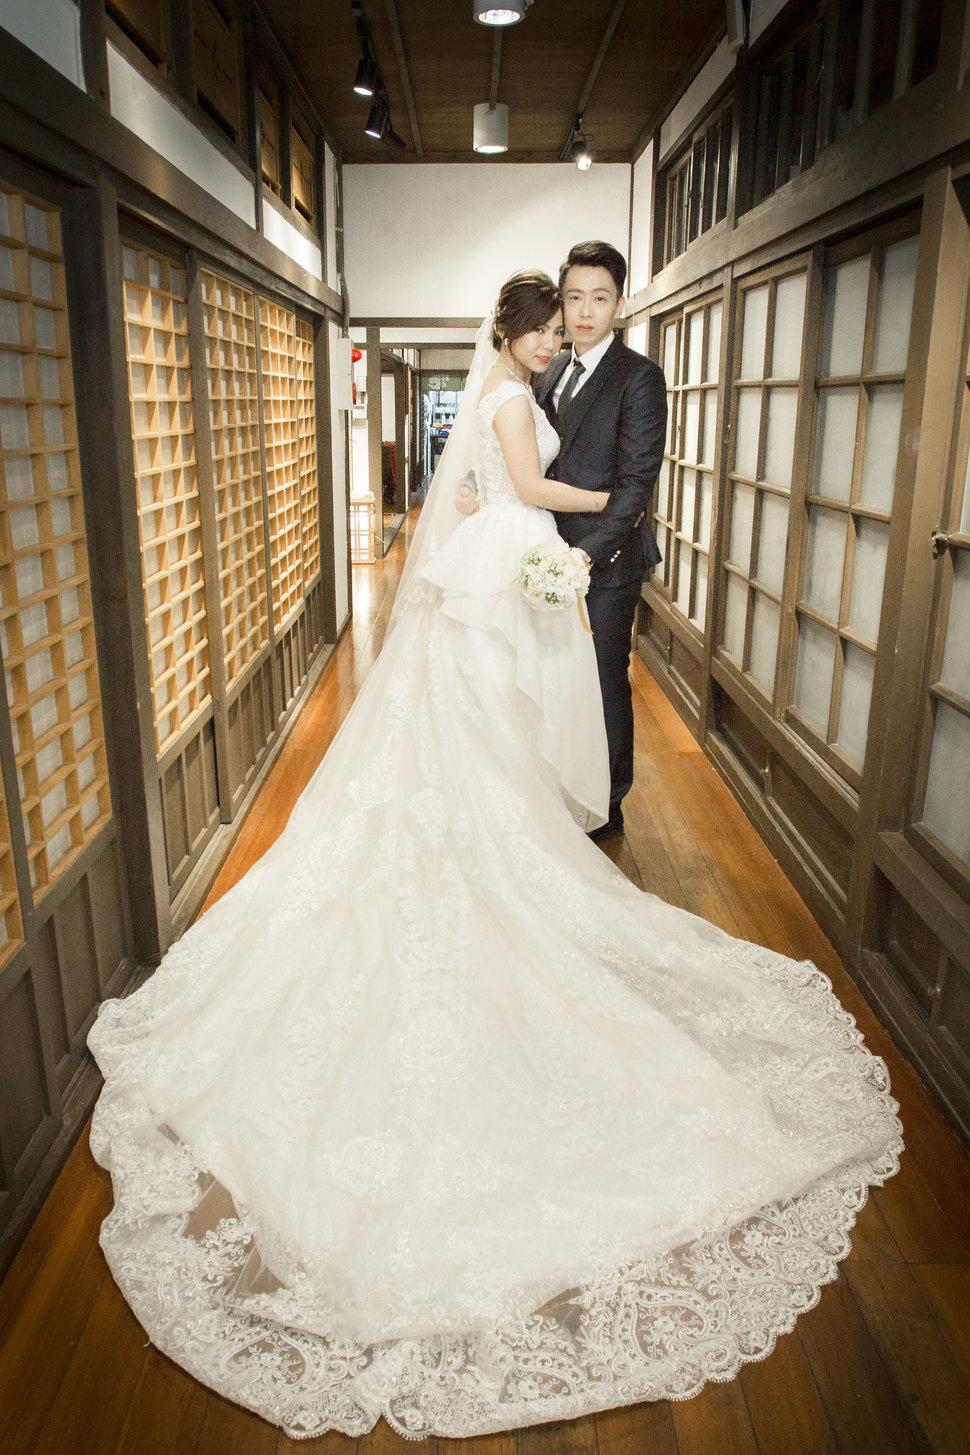 1-186-7-13 - J ART專業攝錄影團隊《結婚吧》